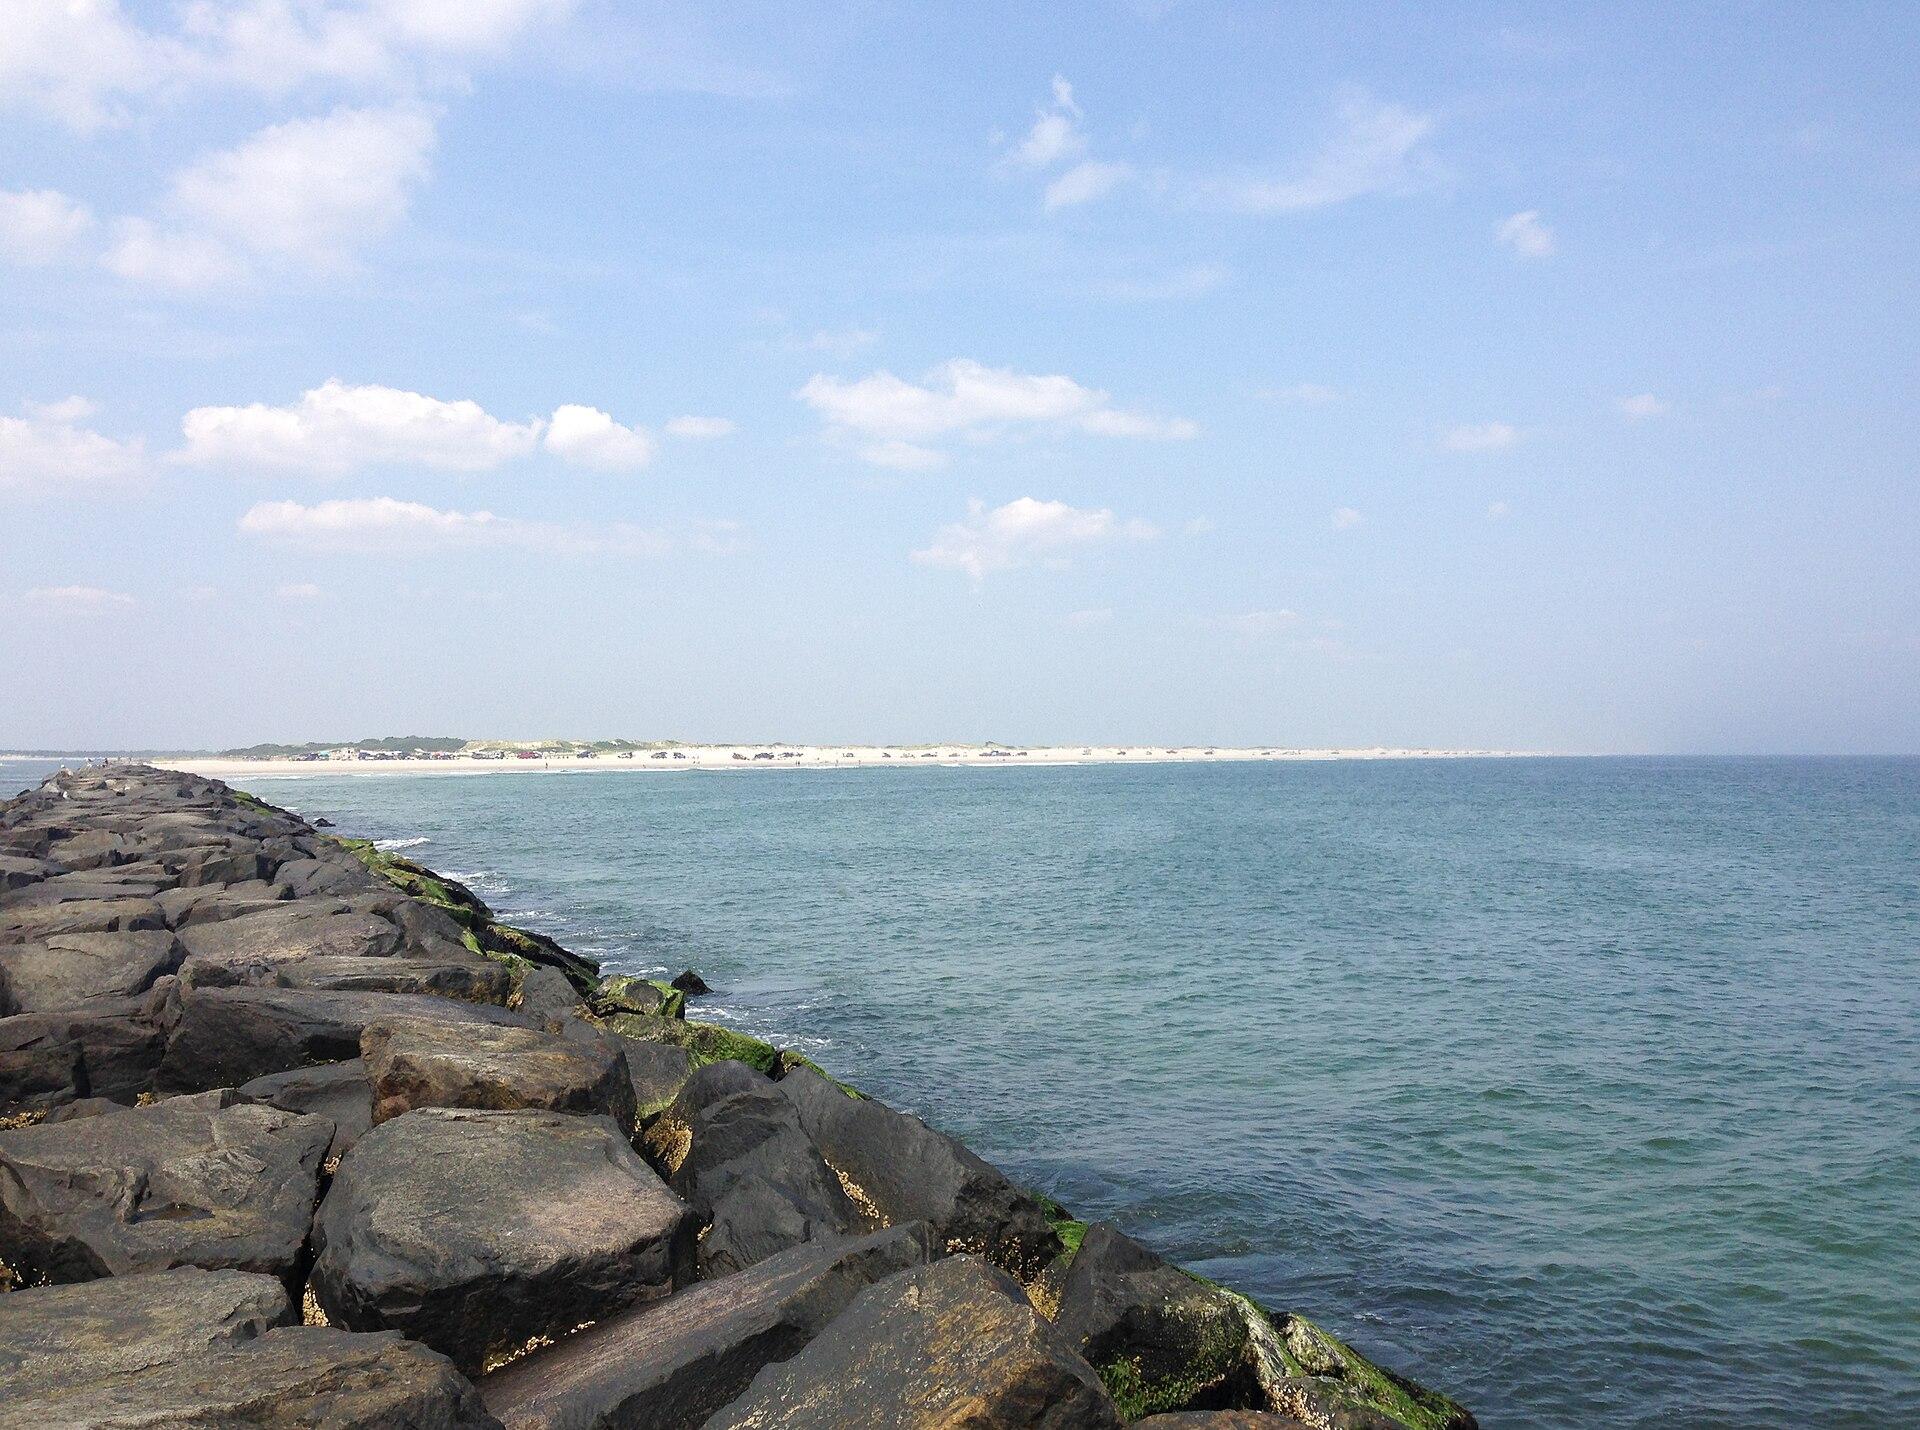 North Jetty Park Beach